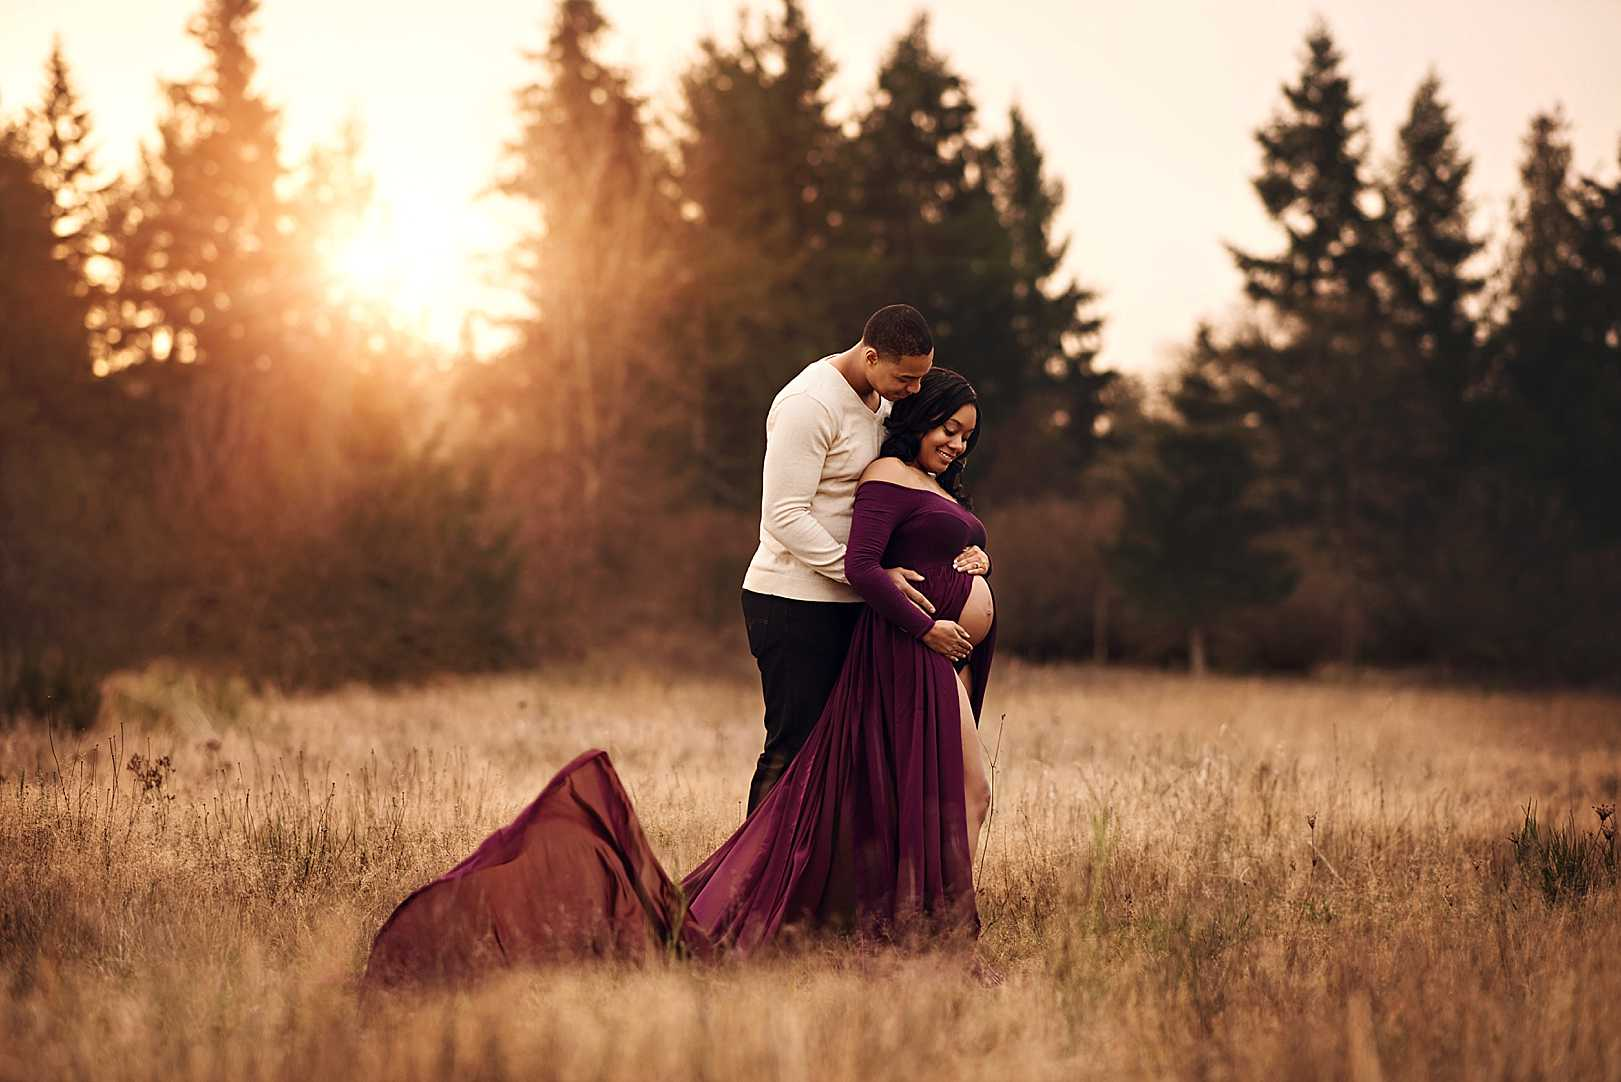 JBLM Maternity Portrait Photographer |  Stephanie Ratto Photography